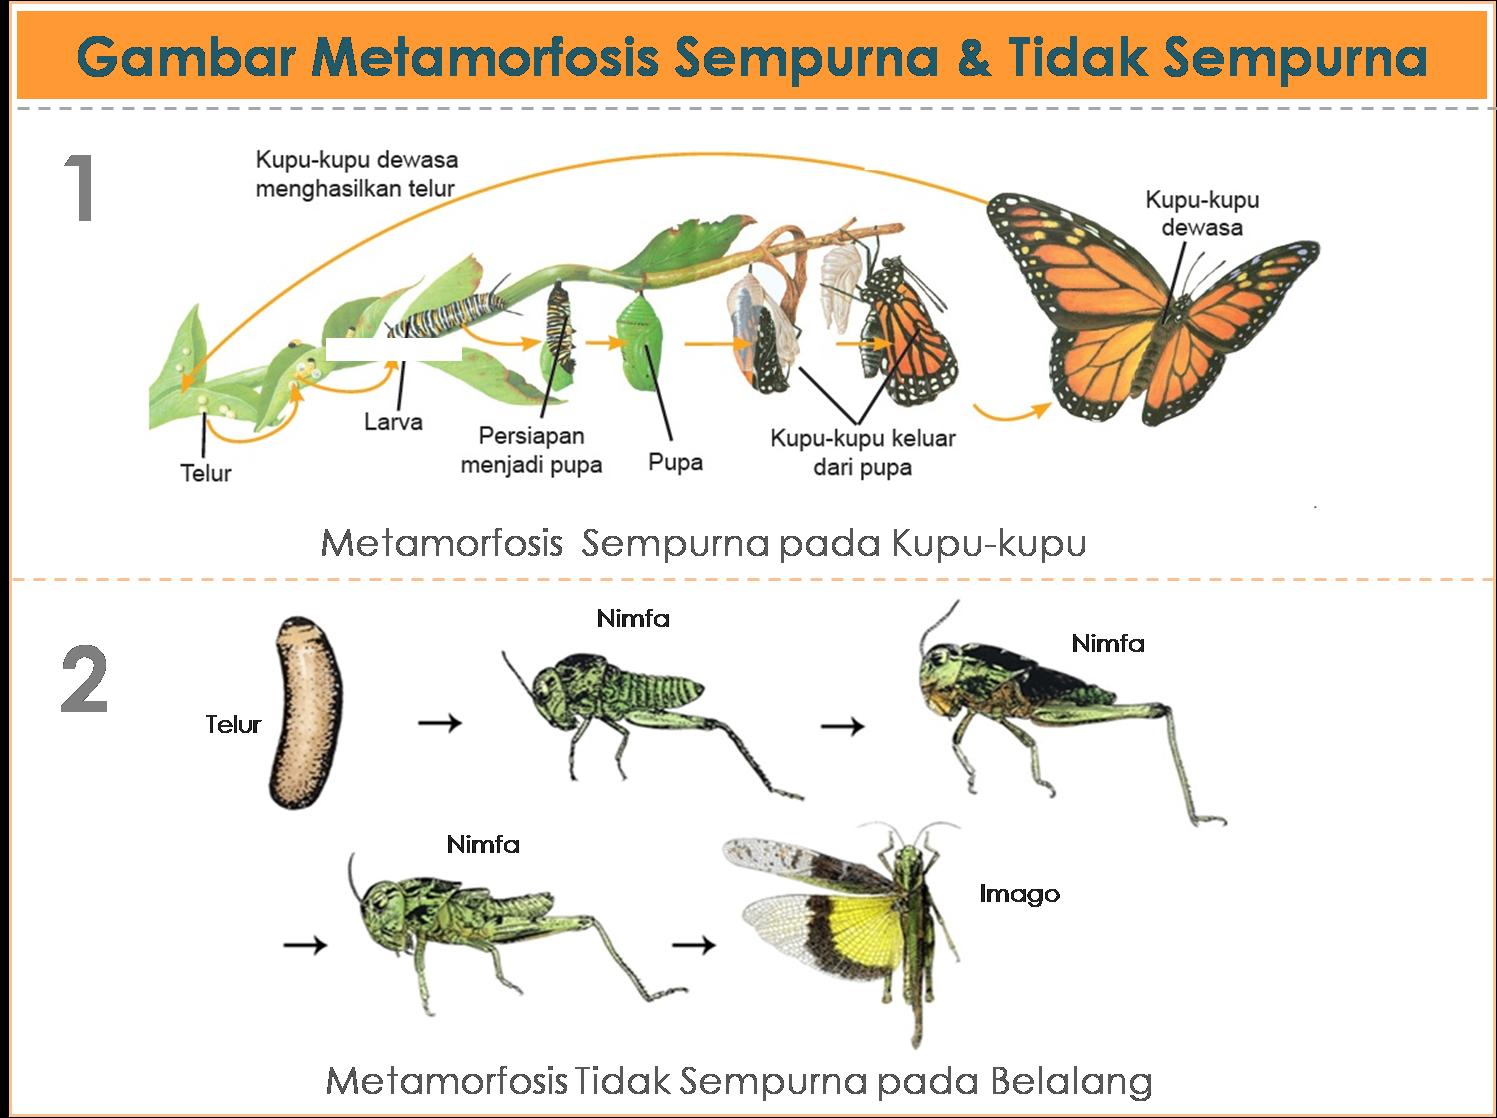 Gambar Metamorfosis Daur Hidup Pada Serangga Dan Amfibi Amfibi Serangga Gambar